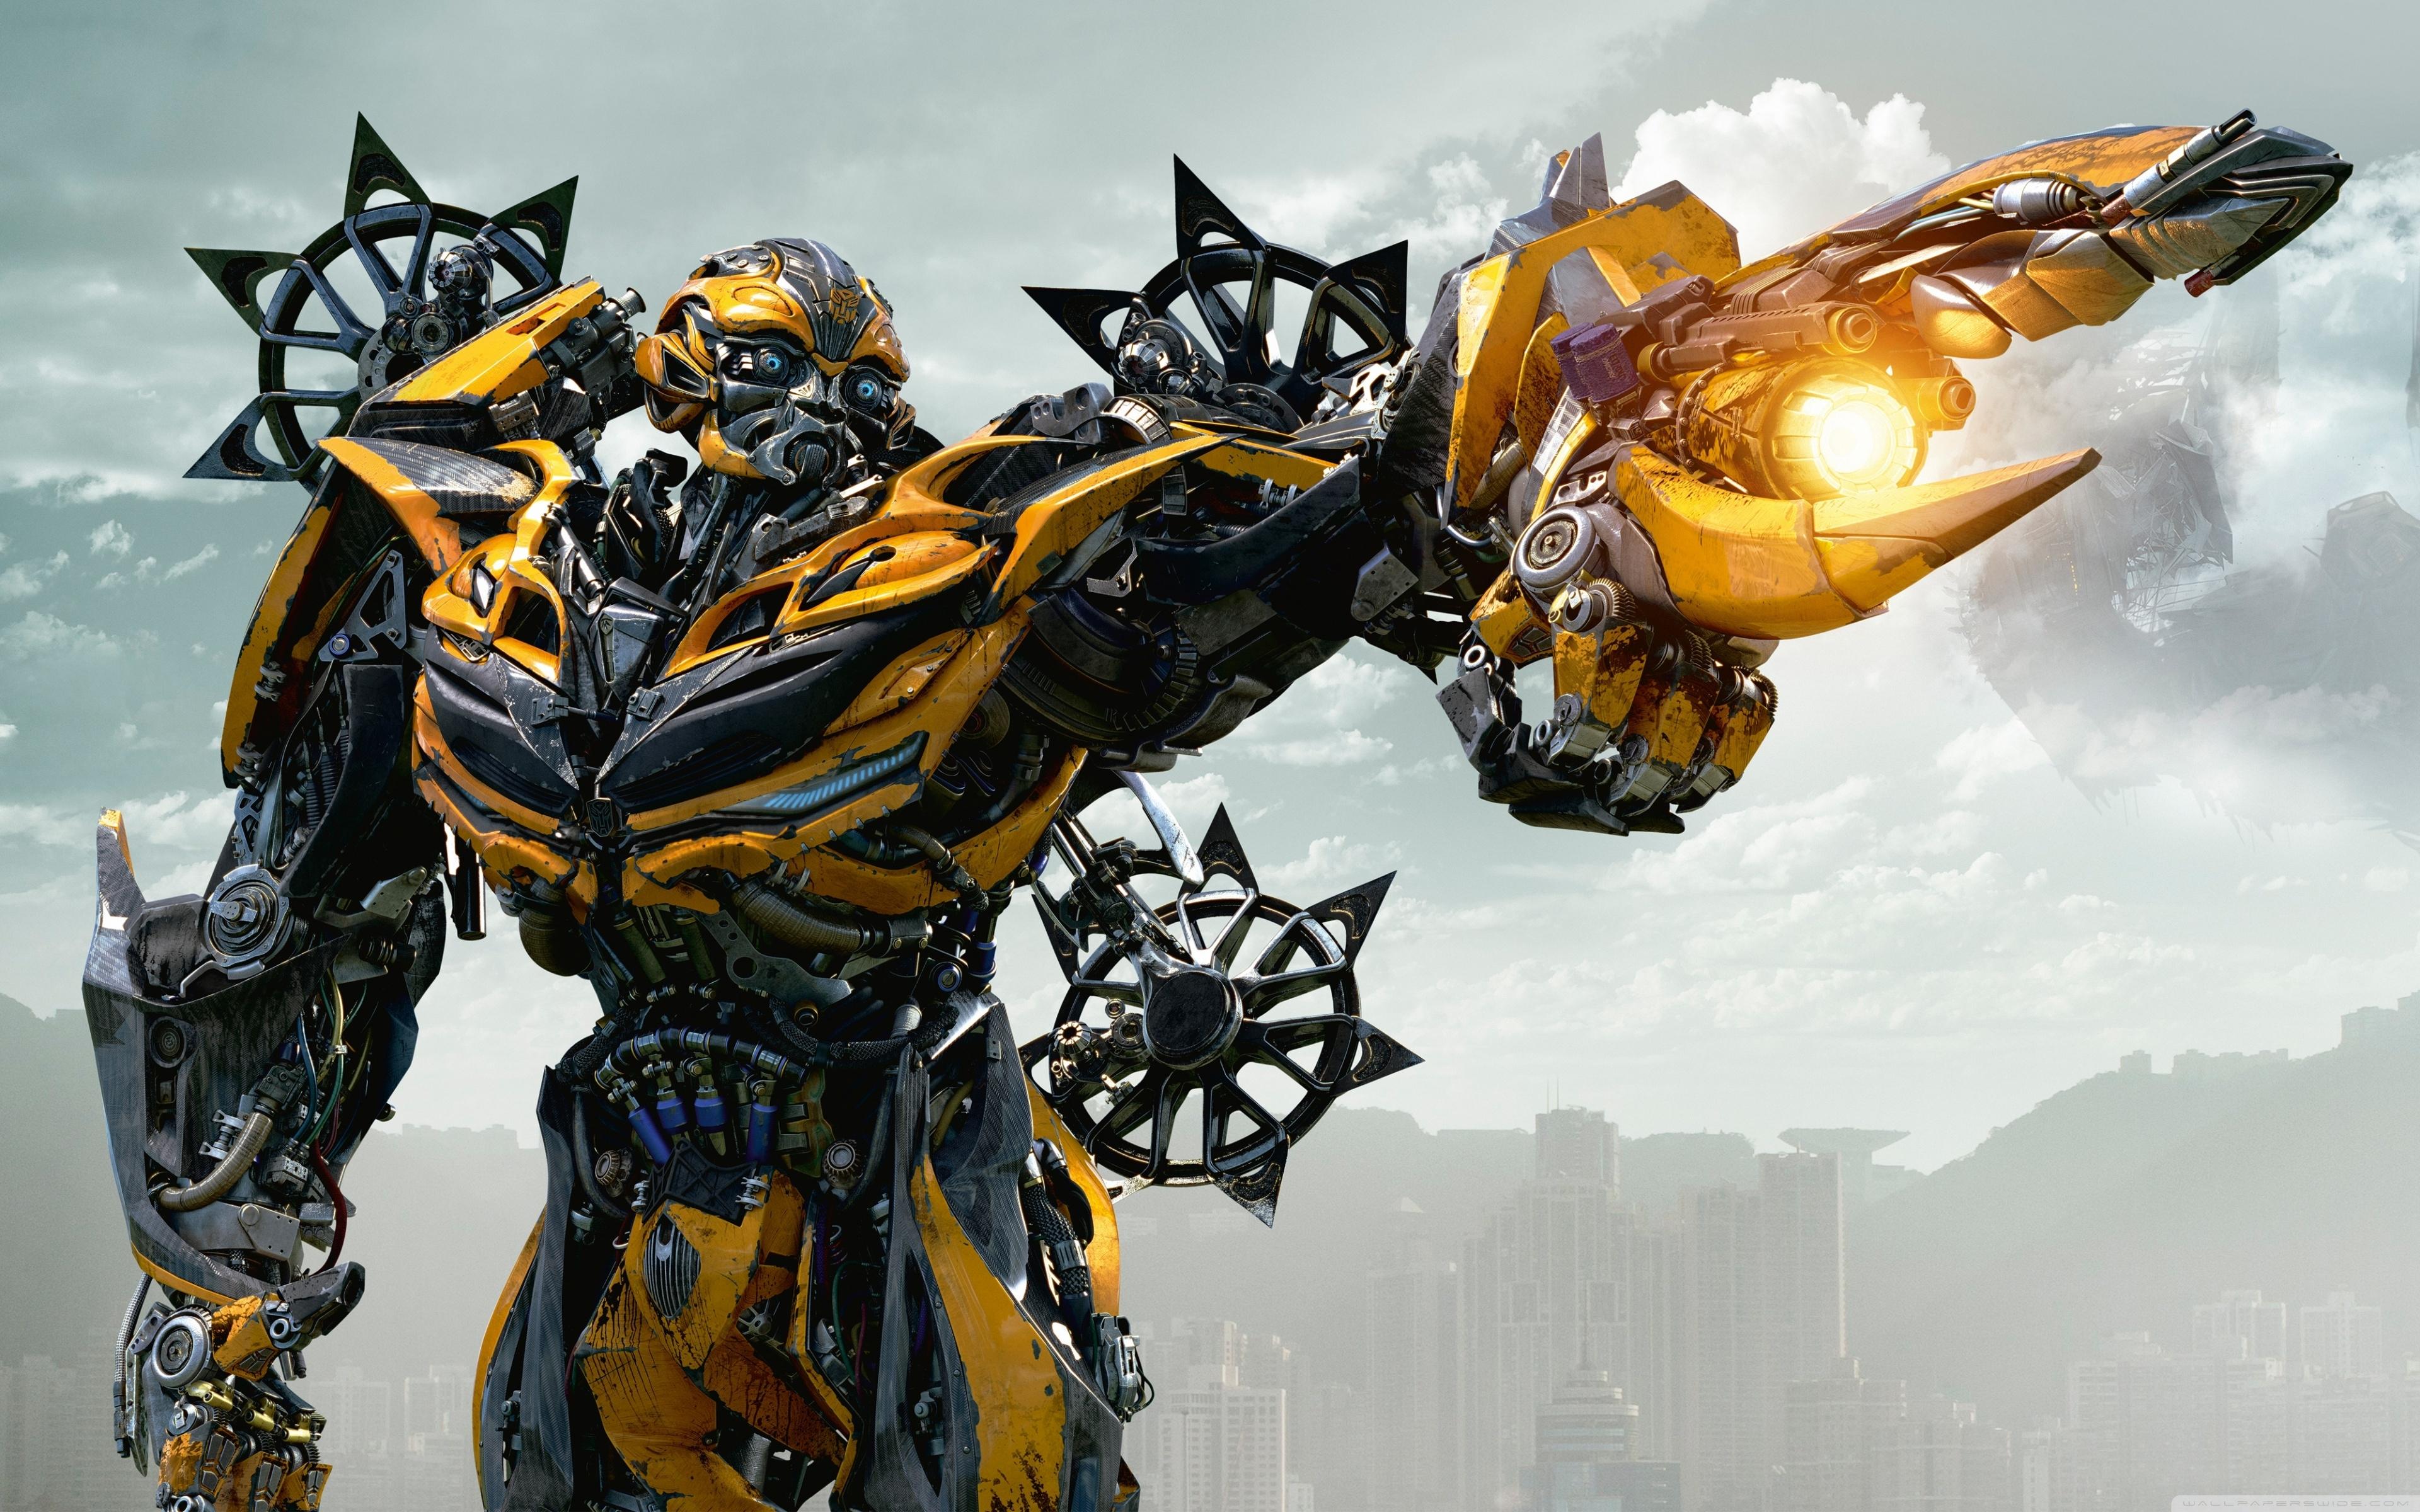 wallpaperswide ❤ transformers hd desktop wallpapers for 4k